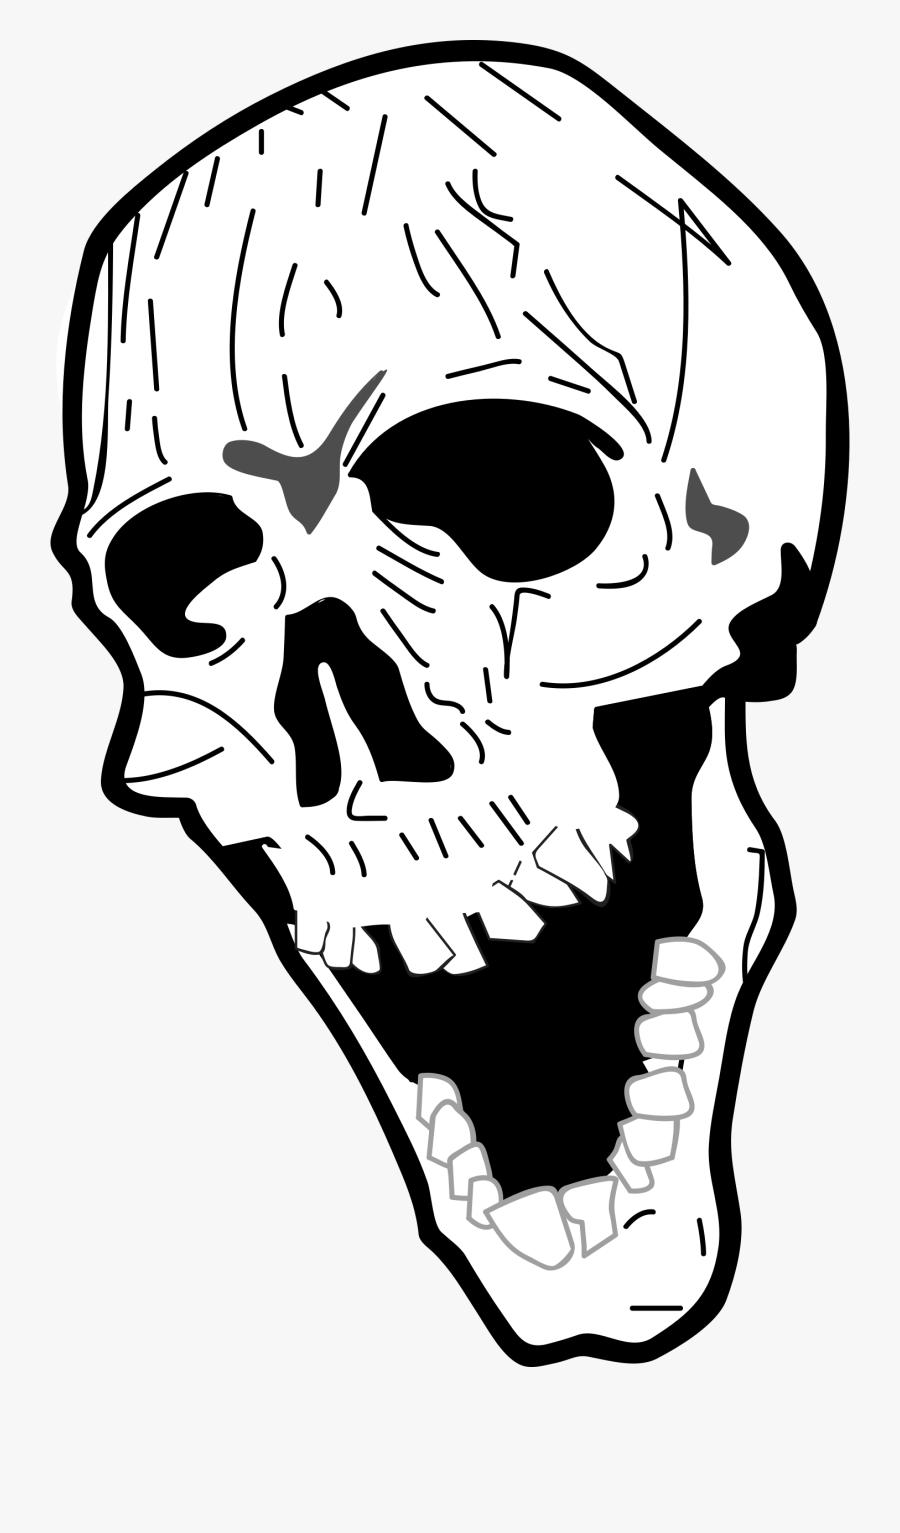 Bone Png - Drużyny Cs Go, Transparent Clipart